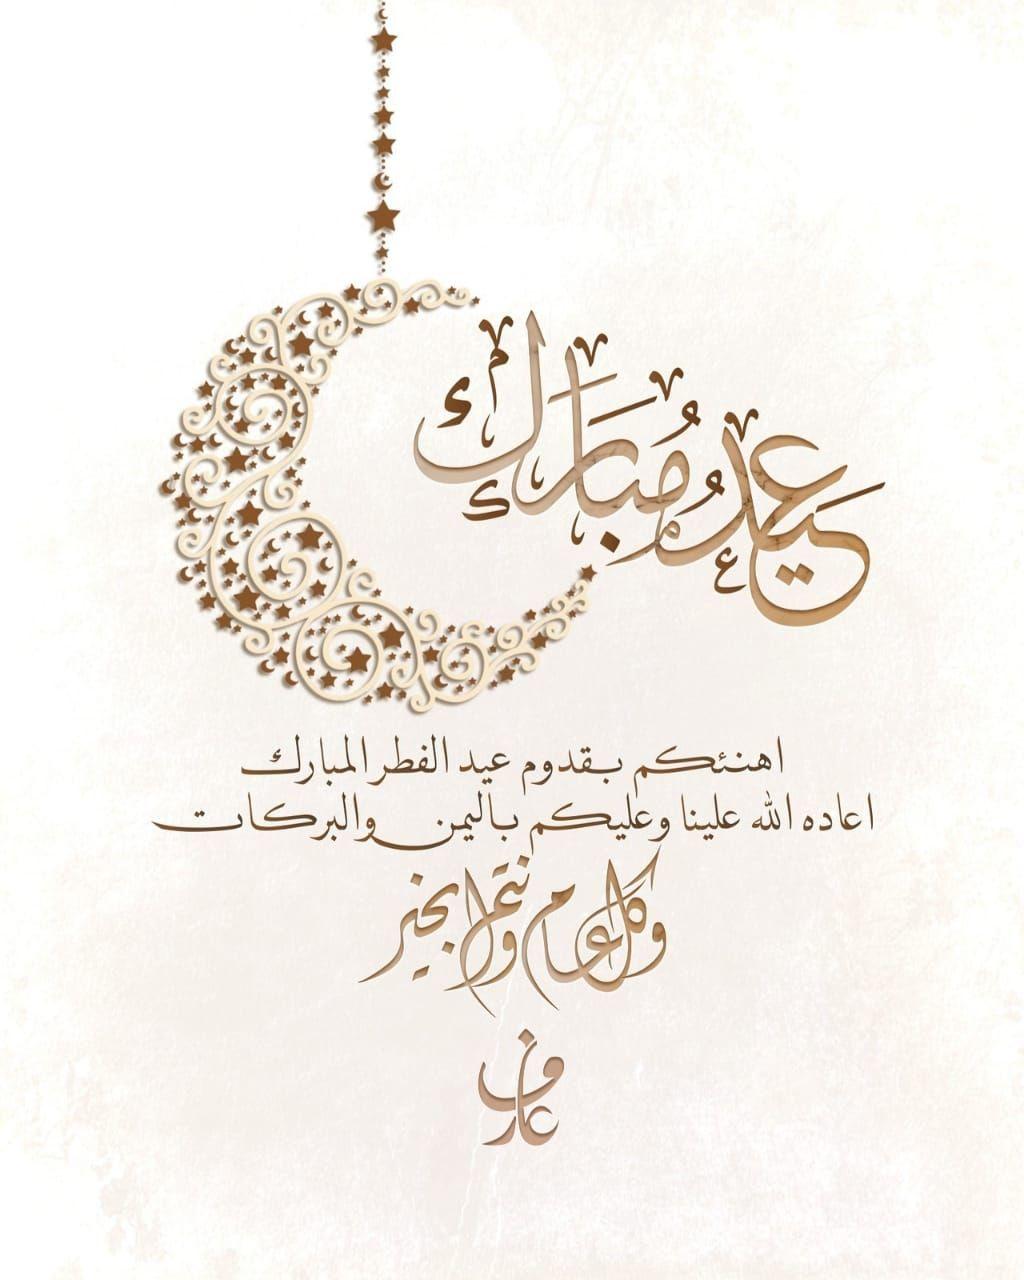 Pin By Manal On كل عام وانتم بخير Eid Card Designs Eid Greetings Eid Al Adha Greetings